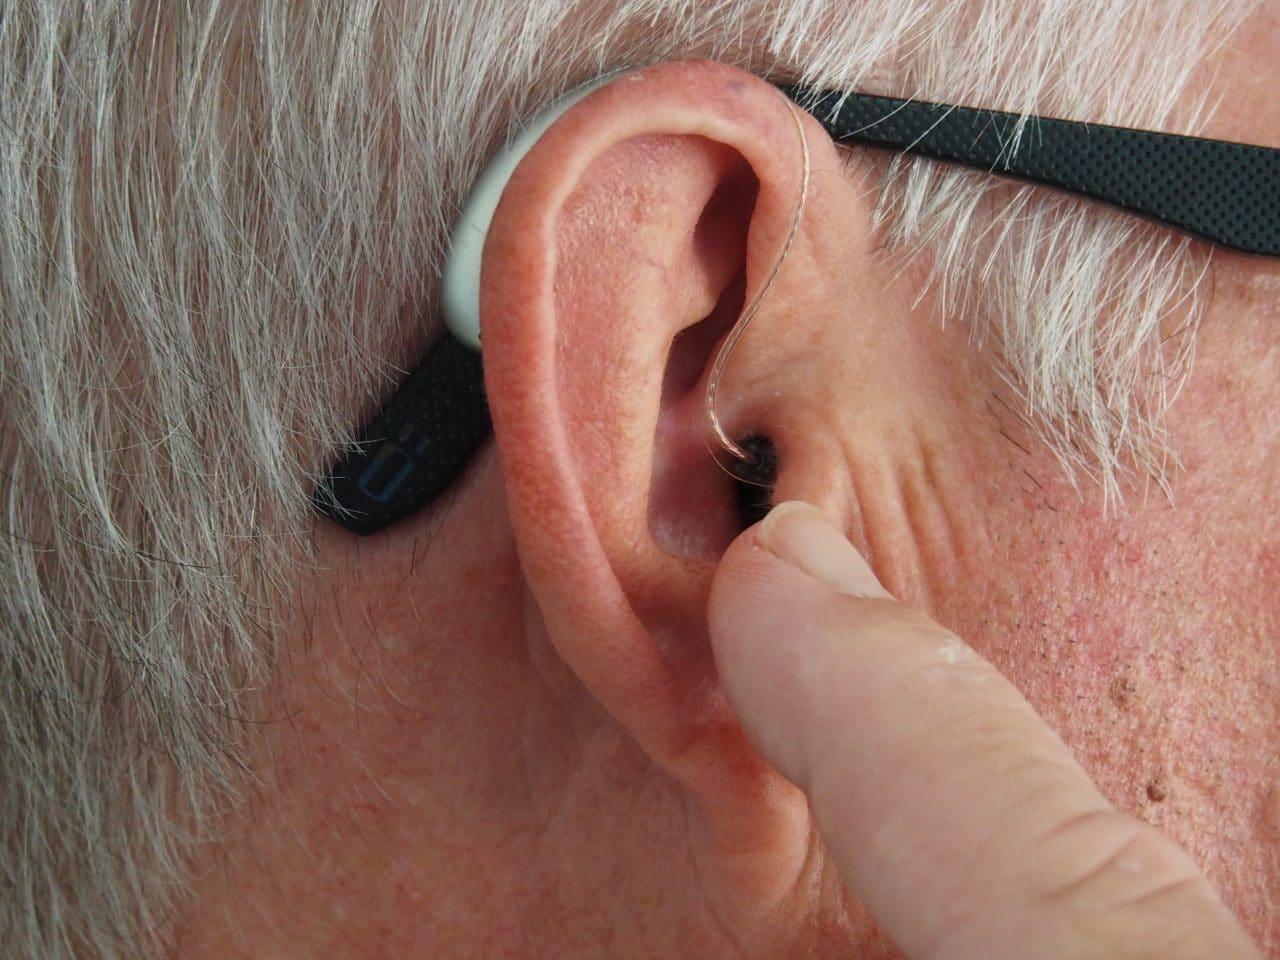 Pan points at his hearing aid.